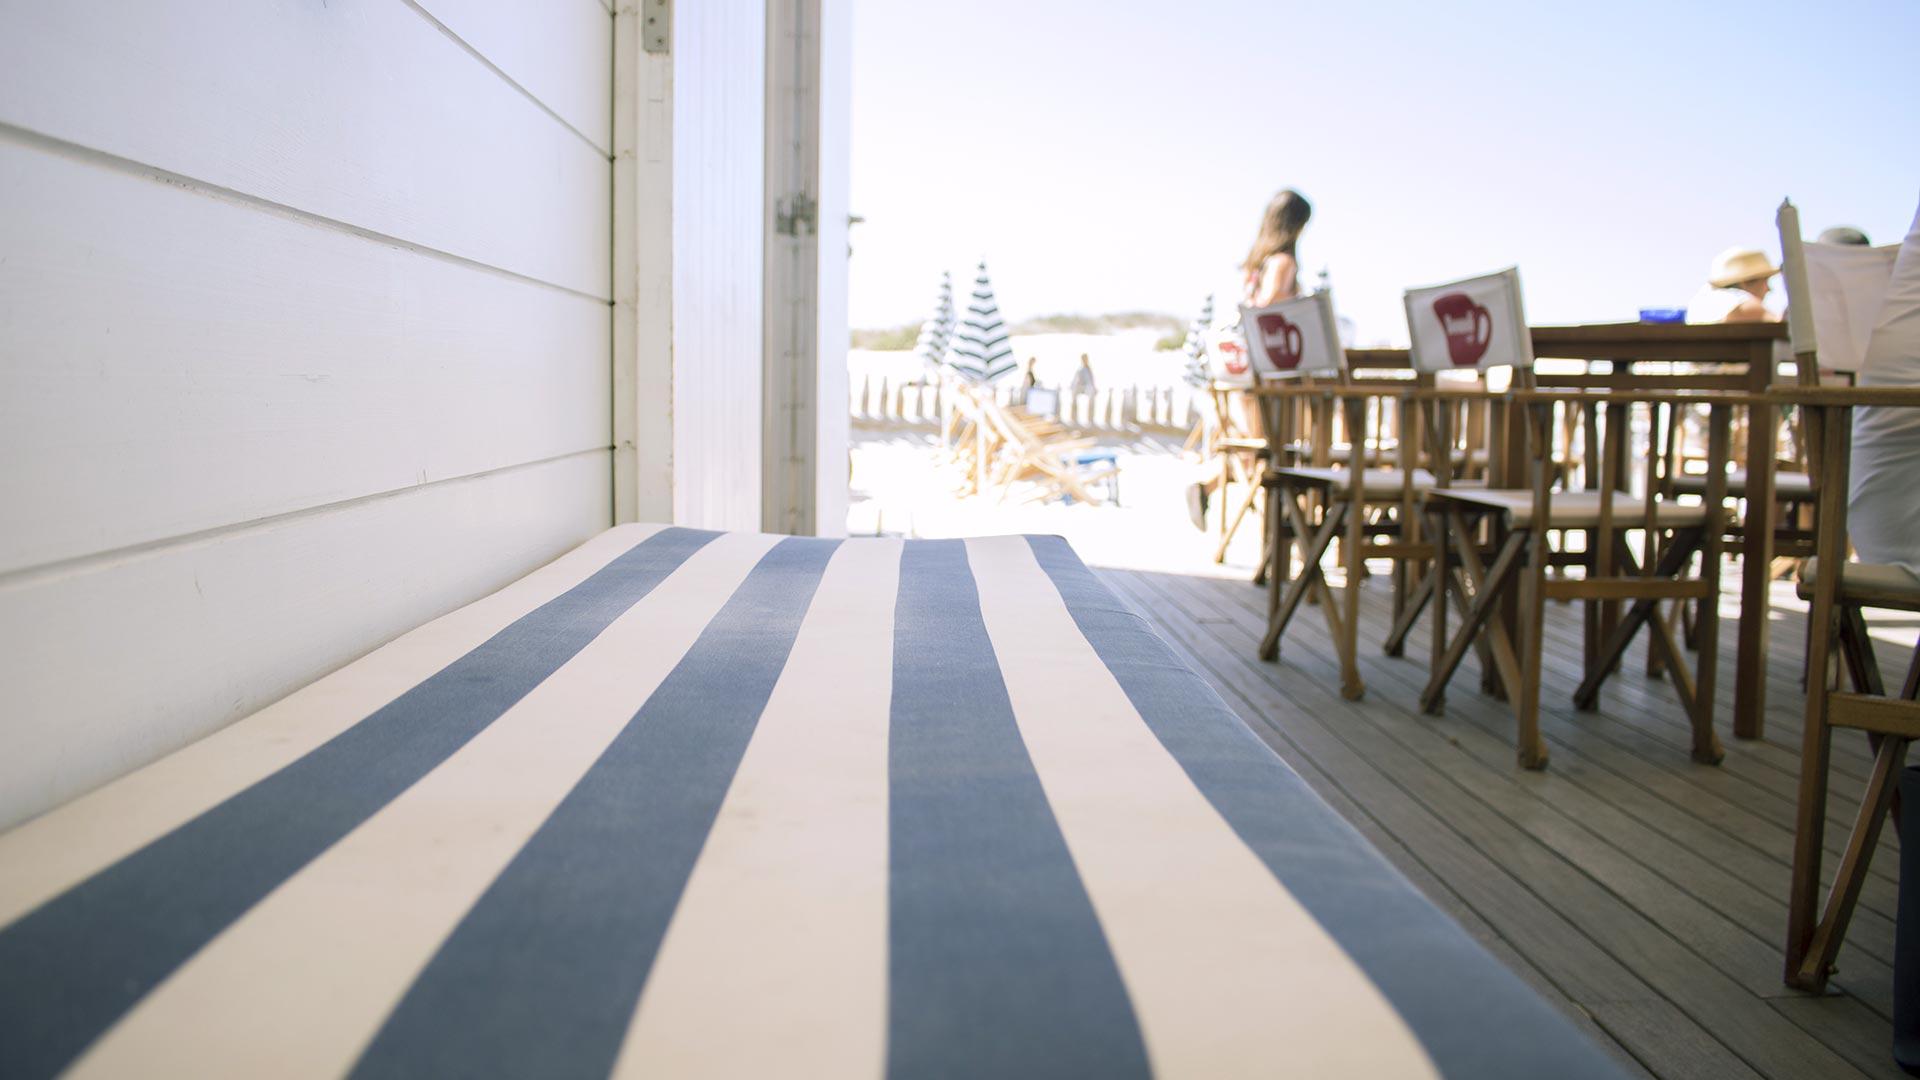 ilhavo-gafanha-da-nazare-praia-da-barra-Aveiro-ville-real-estate-imobiliaria-comprar-arrendar-vender-moradia-apartamento-casa-t0-t1-t2-t3-t4-2